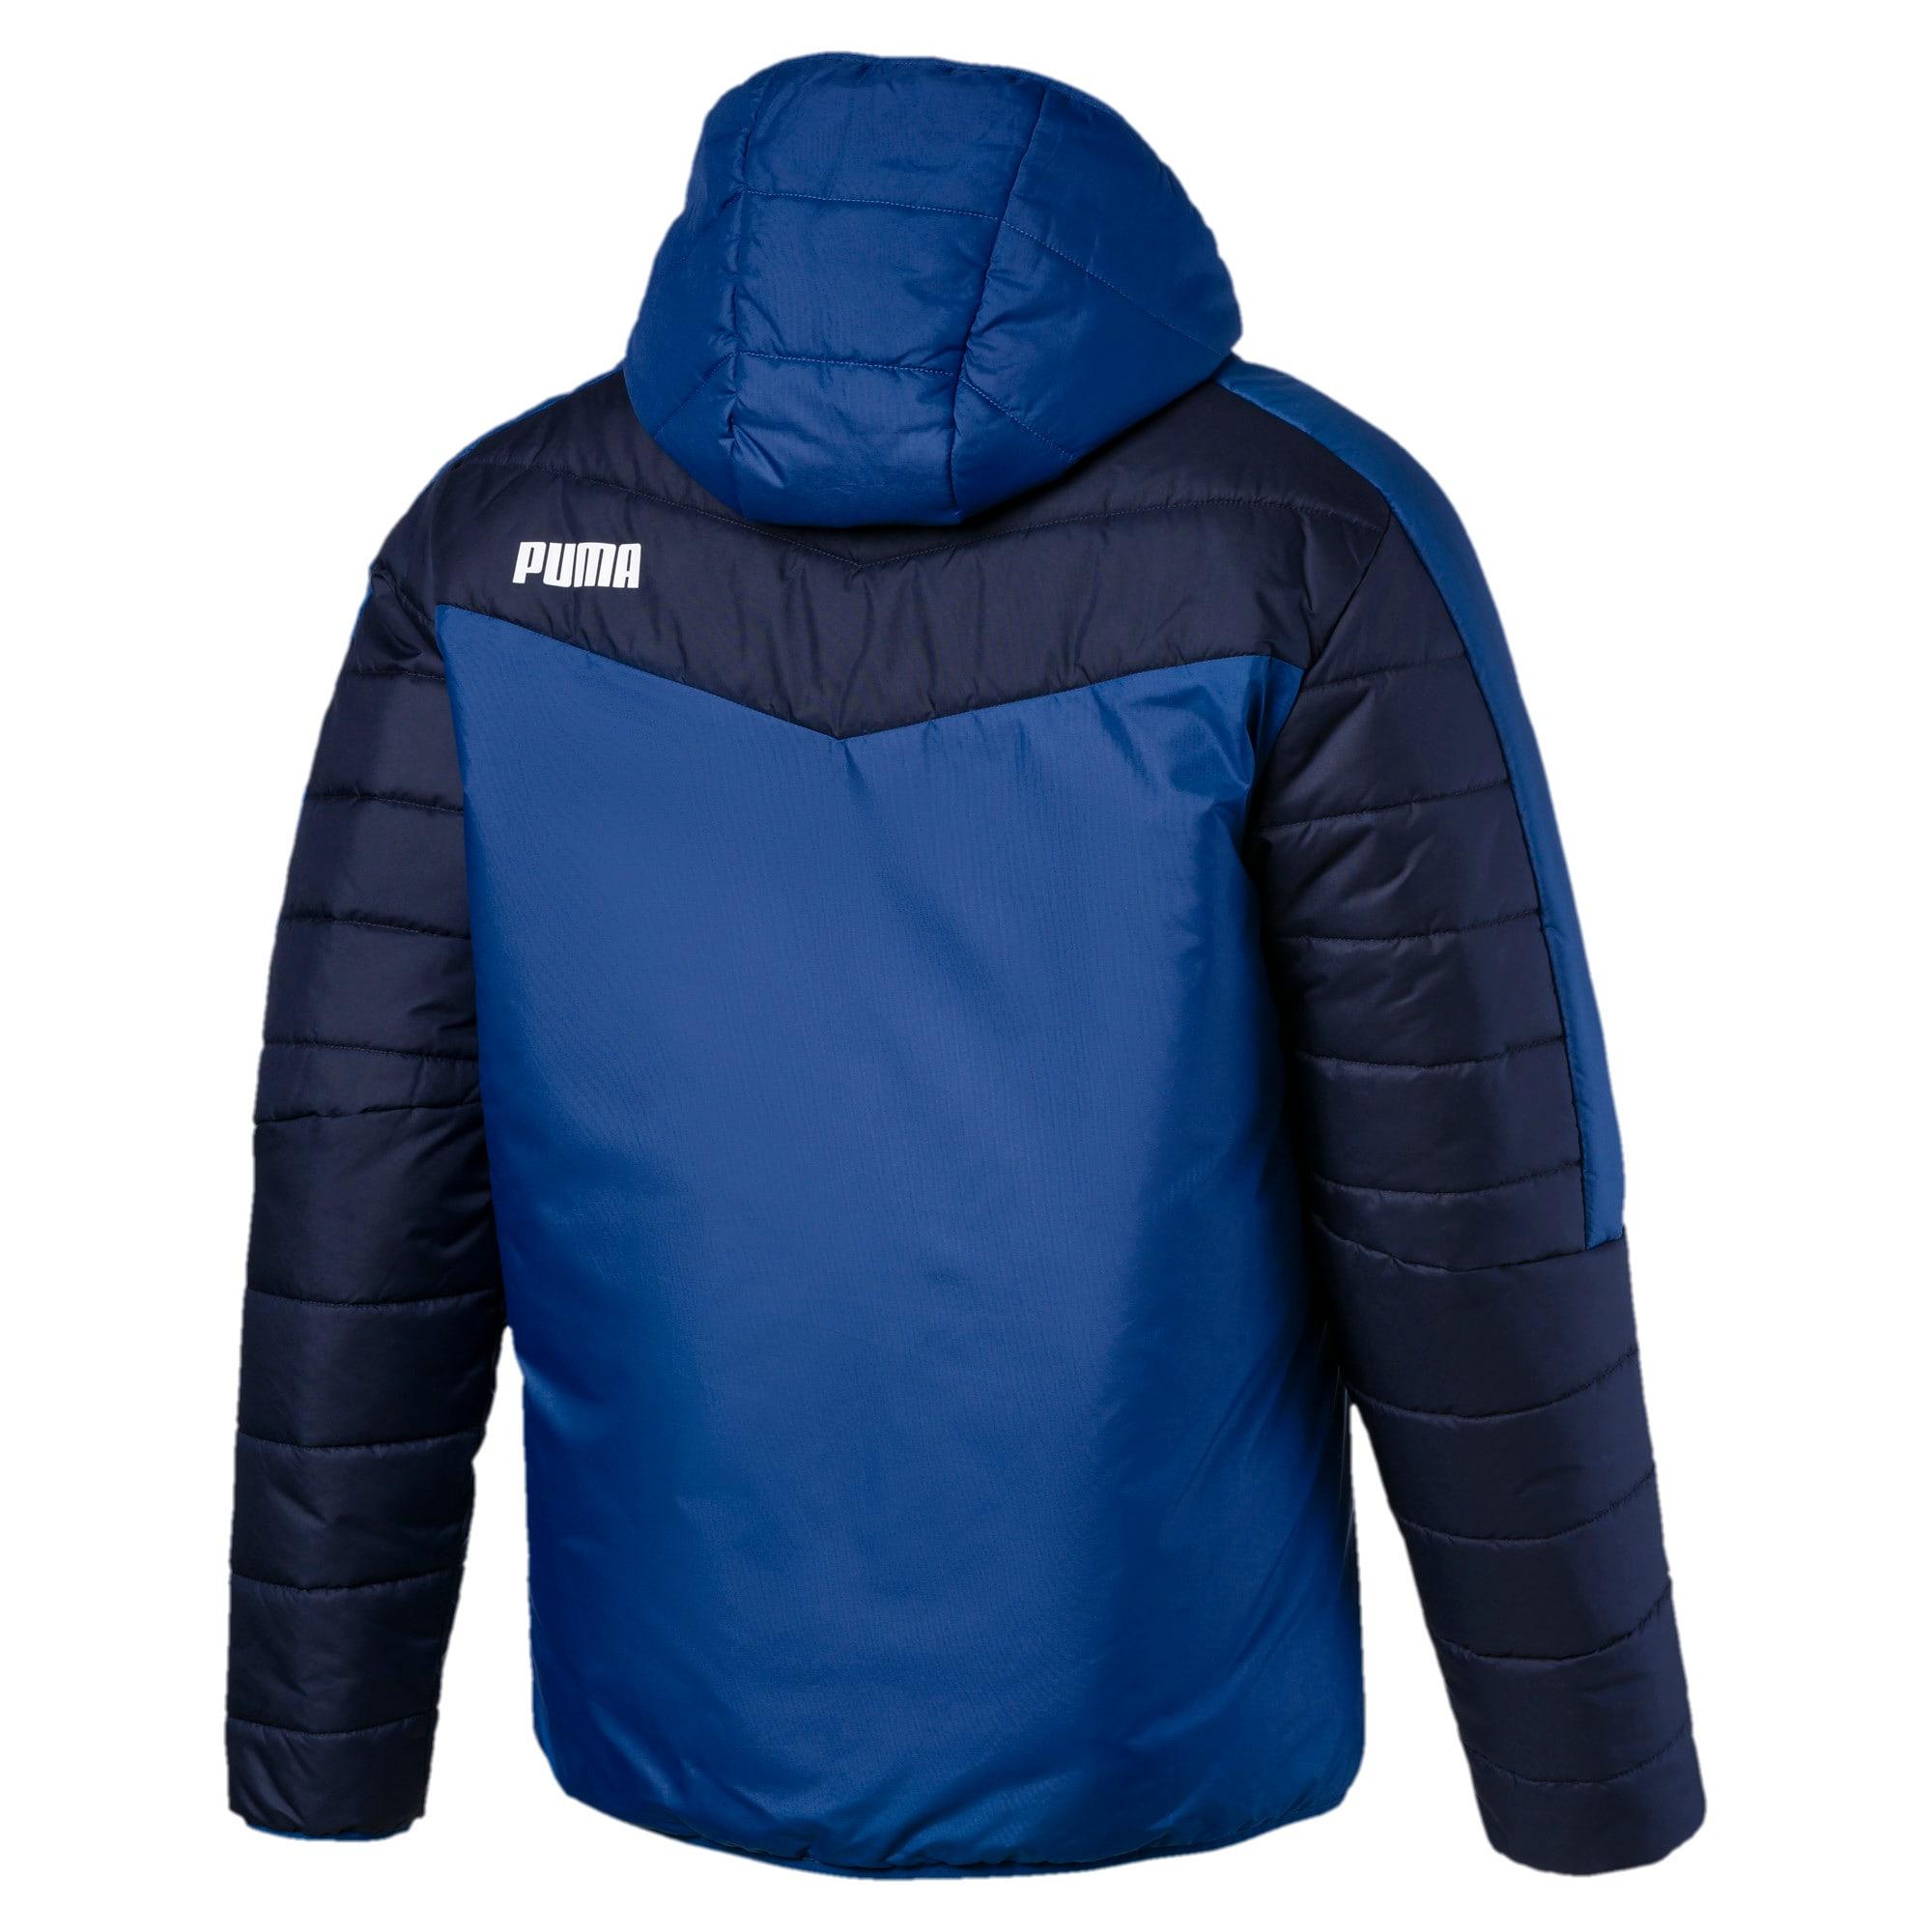 Thumbnail 5 of warmCELL Men's Padded Jacket, Galaxy Blue-Peacoat, medium